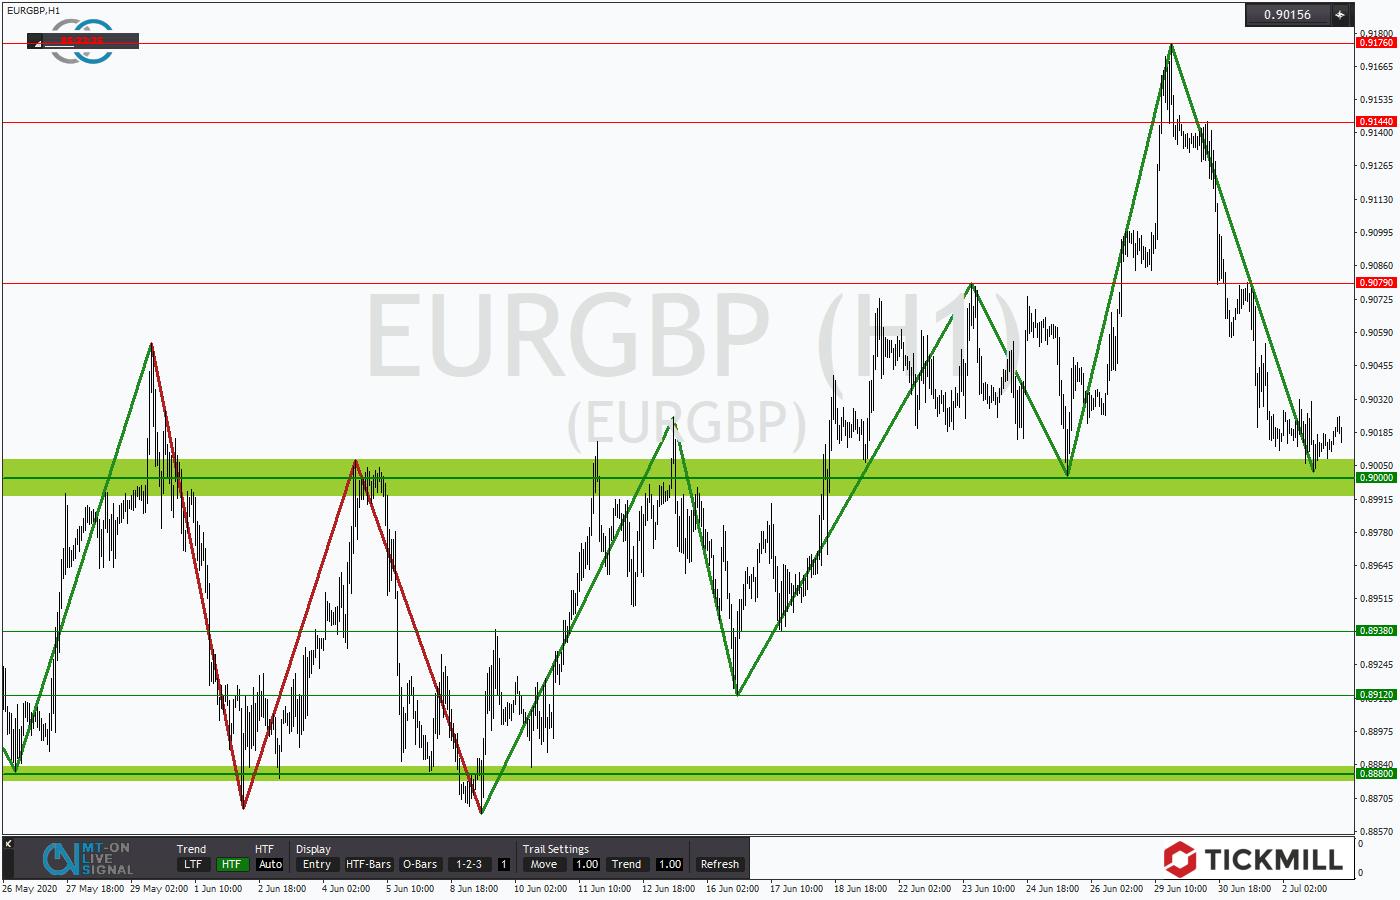 Tickmill-Analyse: EURGBP am Ausbruchslevel